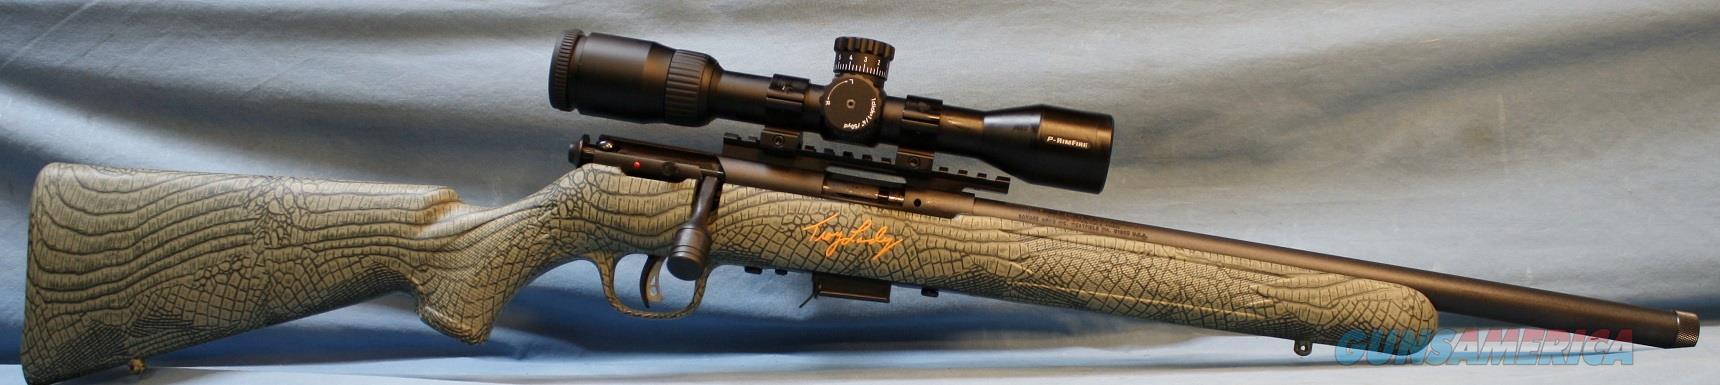 Savage 93FV-SR Bolt Action Rifle, .22 WMR Free Shipping!  Guns > Rifles > Savage Rifles > Rimfire